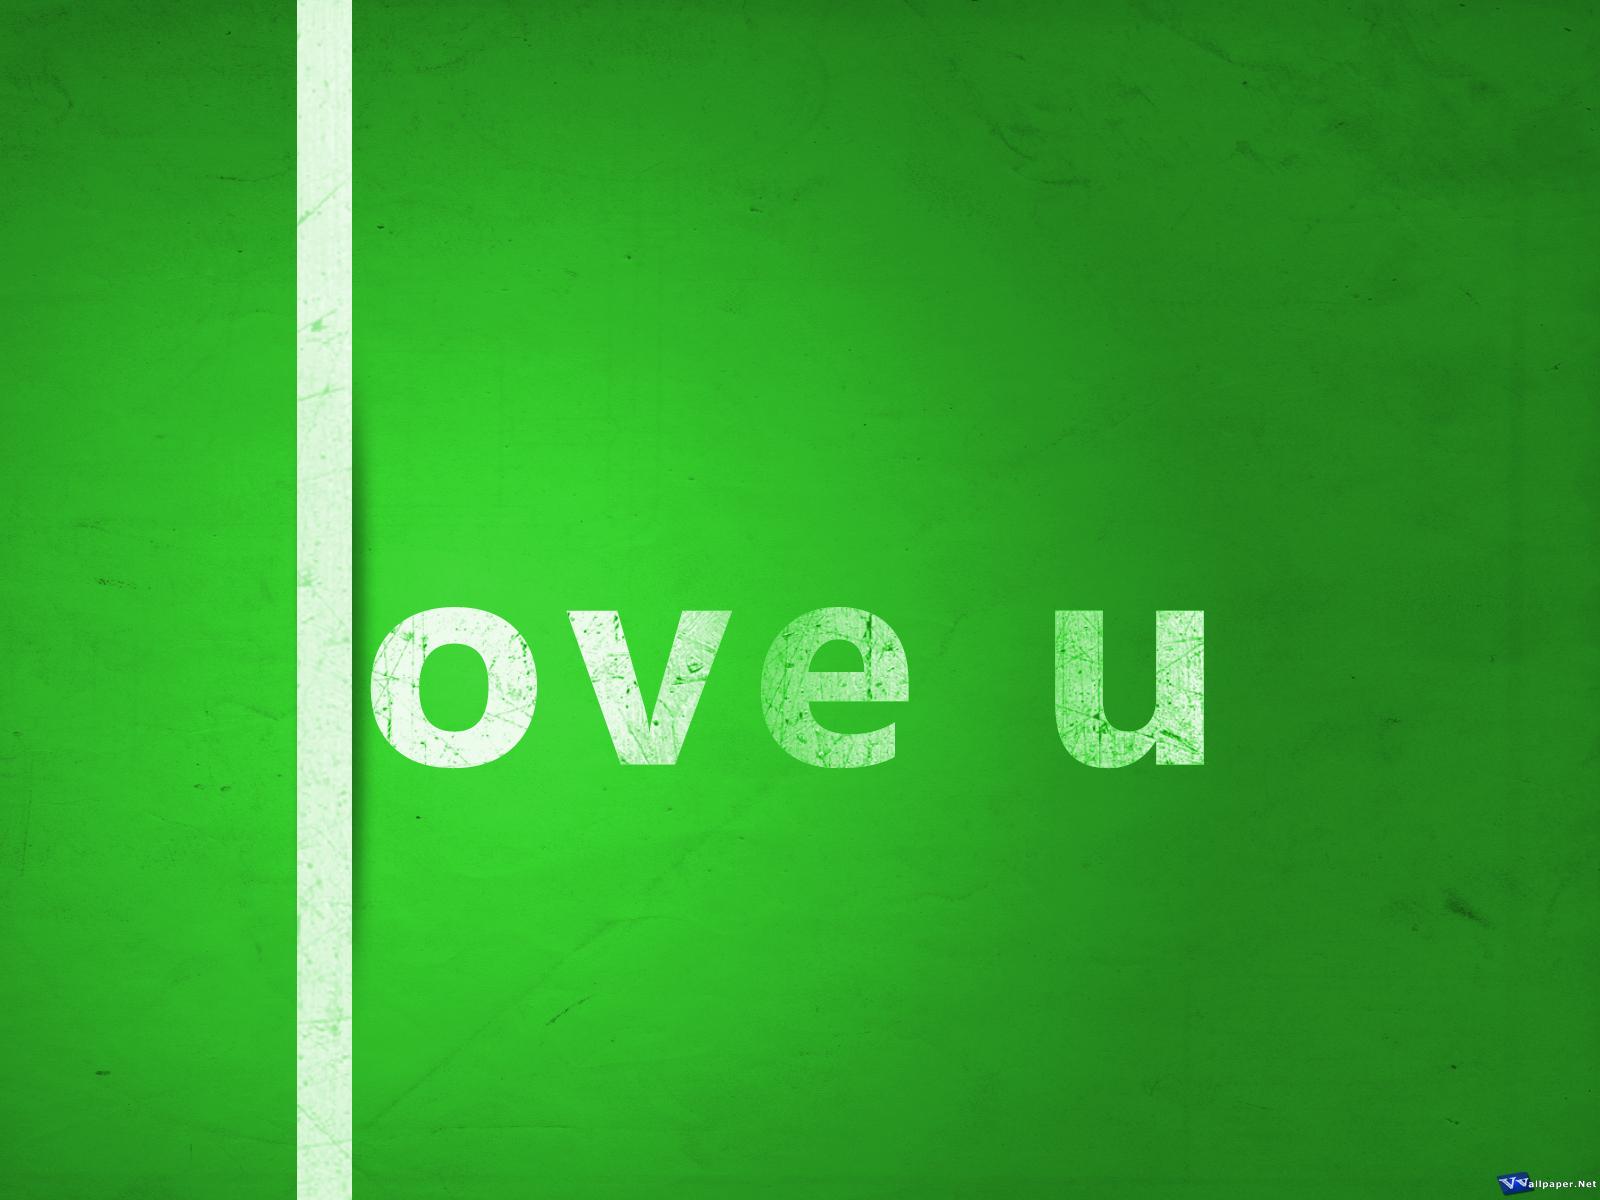 http://1.bp.blogspot.com/-neXpc9VKeFc/TpYfNMc8PAI/AAAAAAAADaE/iZ4W0UidYoA/s1600/Love_U_Wallpaper_Green_Vvallpaper.Net.jpg